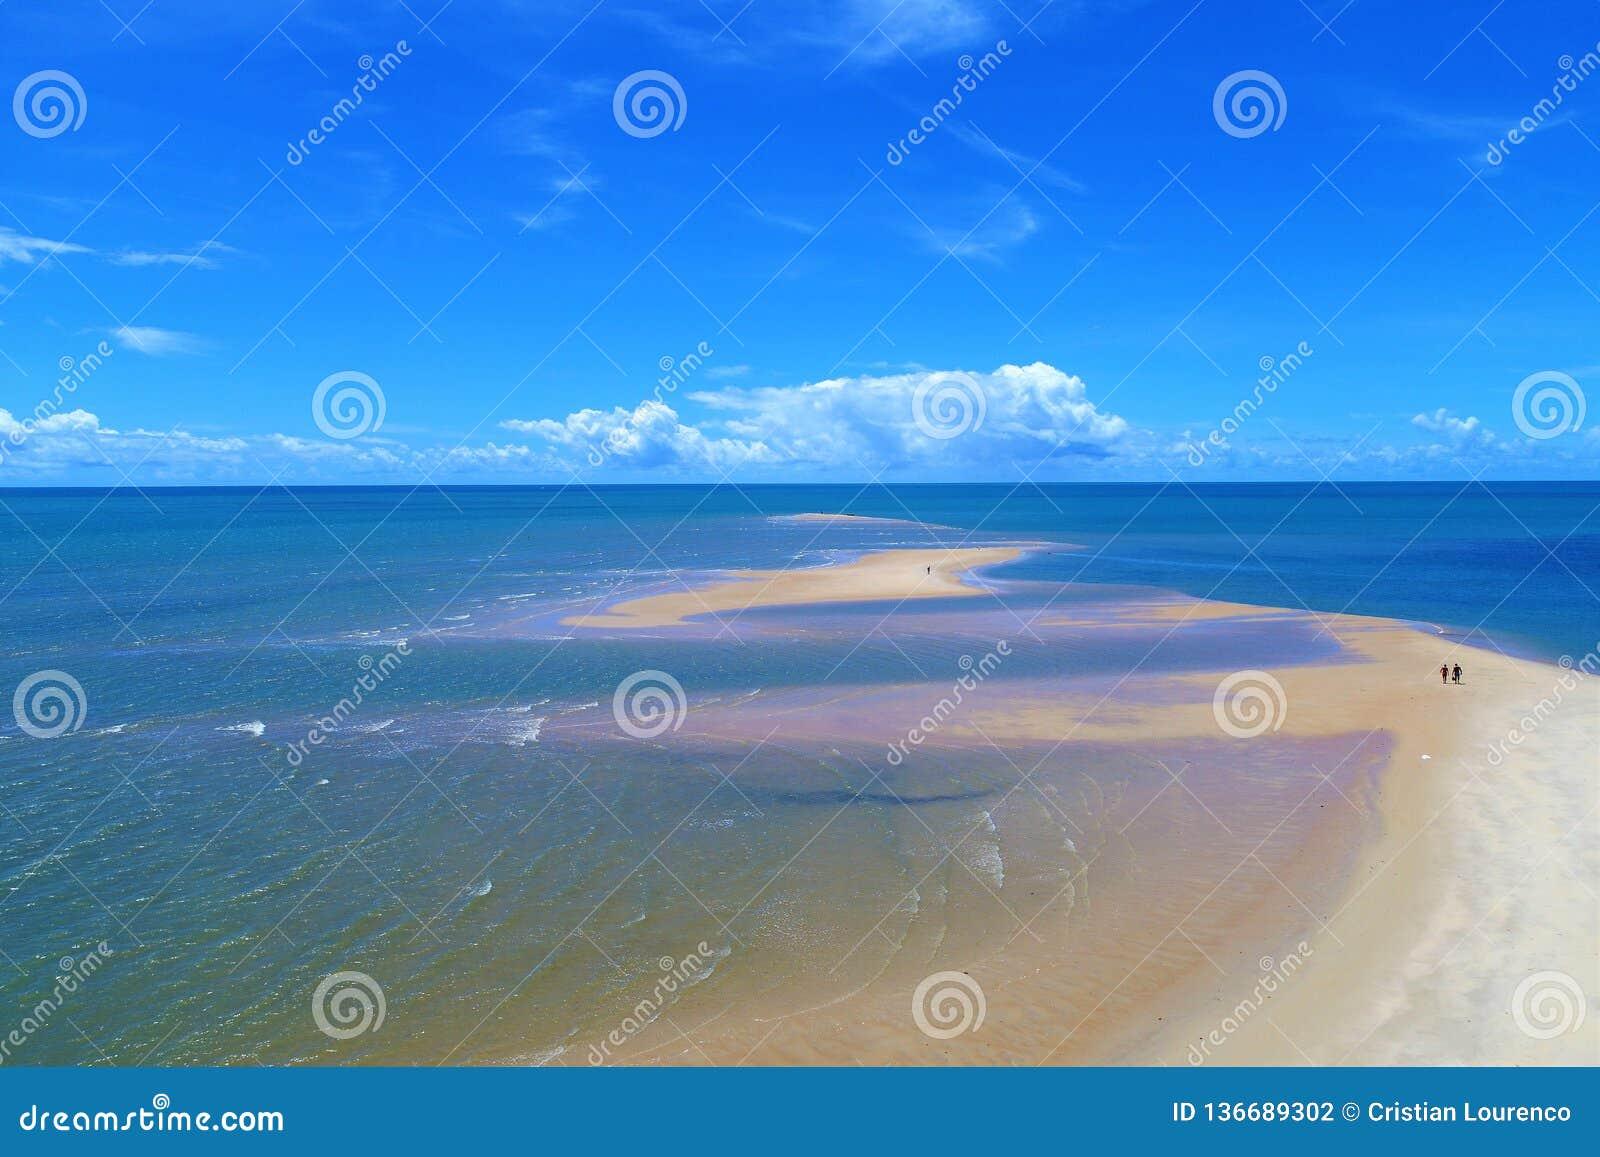 Corumbau, Bahia, Brazil: View of beautiful beach with a big sand`s bank